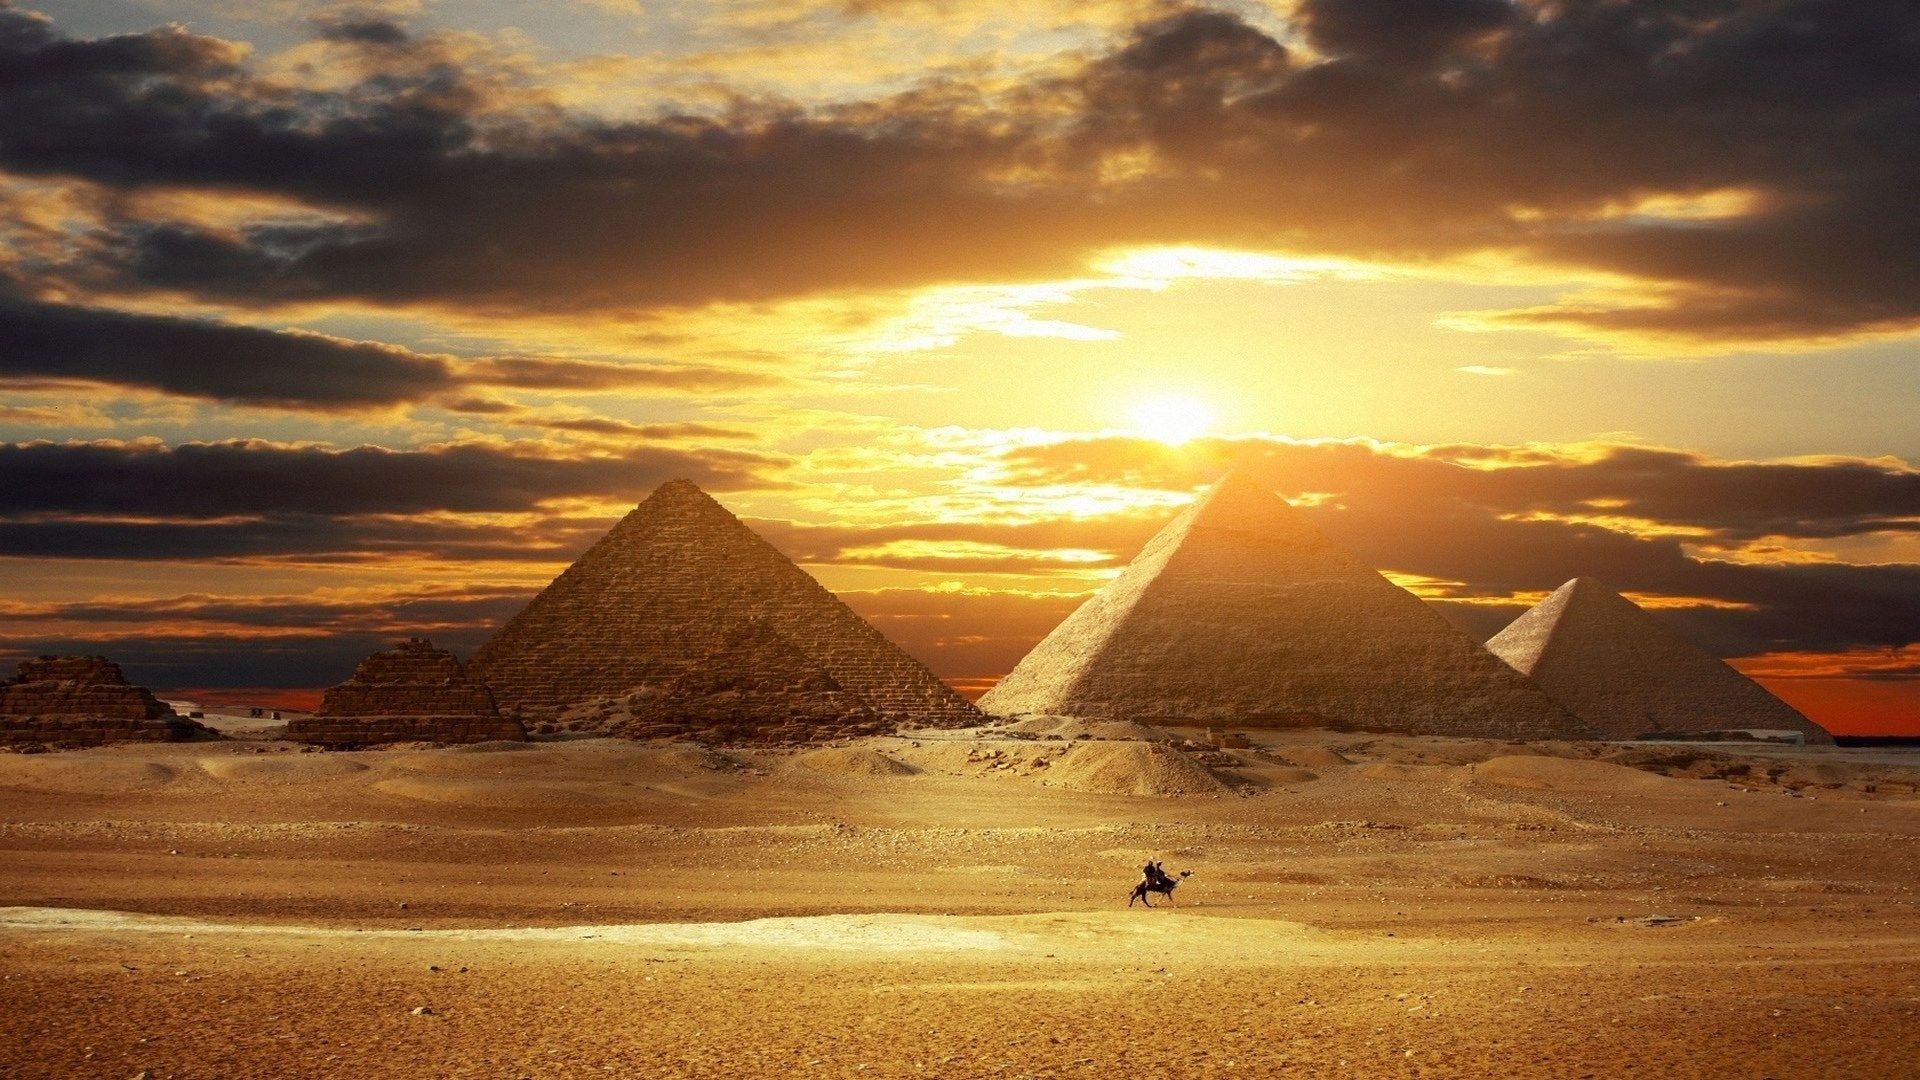 Pyramid Wallpaper 1080p High Quality